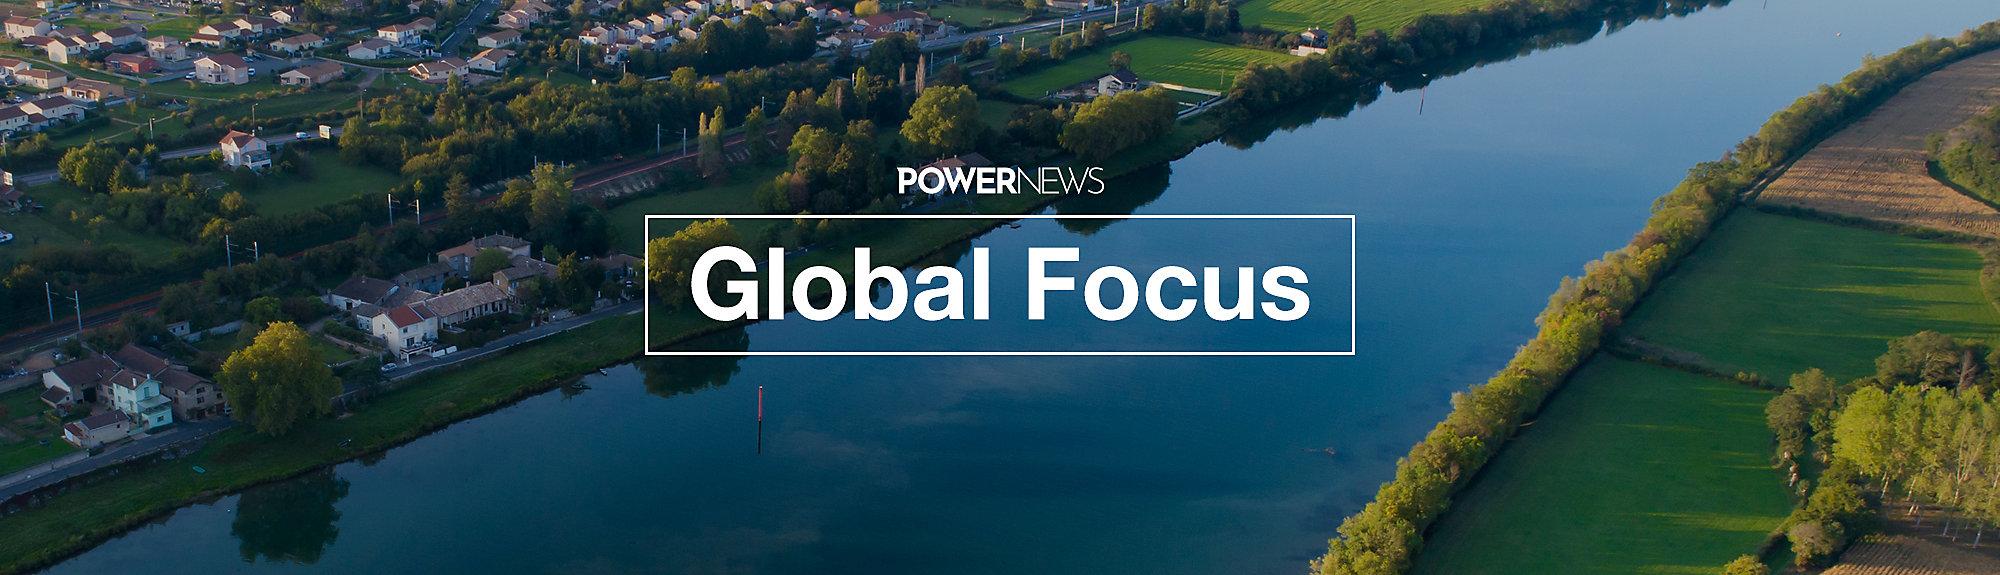 Global Focus  Powernews